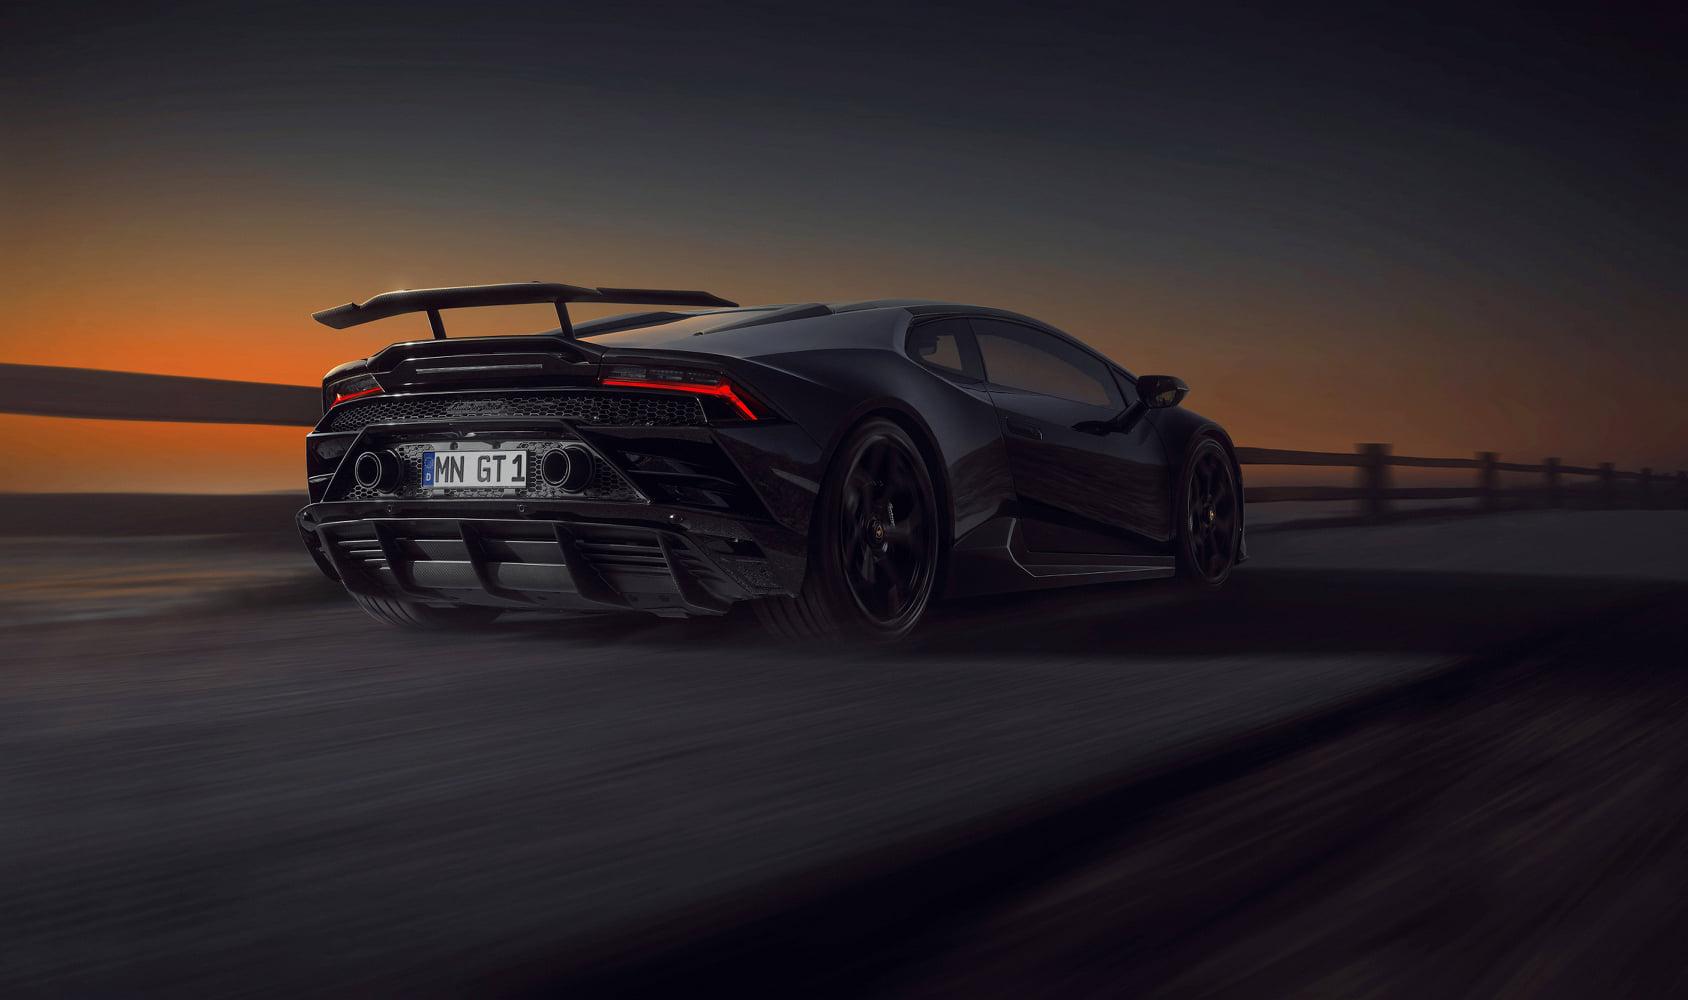 Lamborghini-Huracan-Evo-RWD-by-Novitec-4